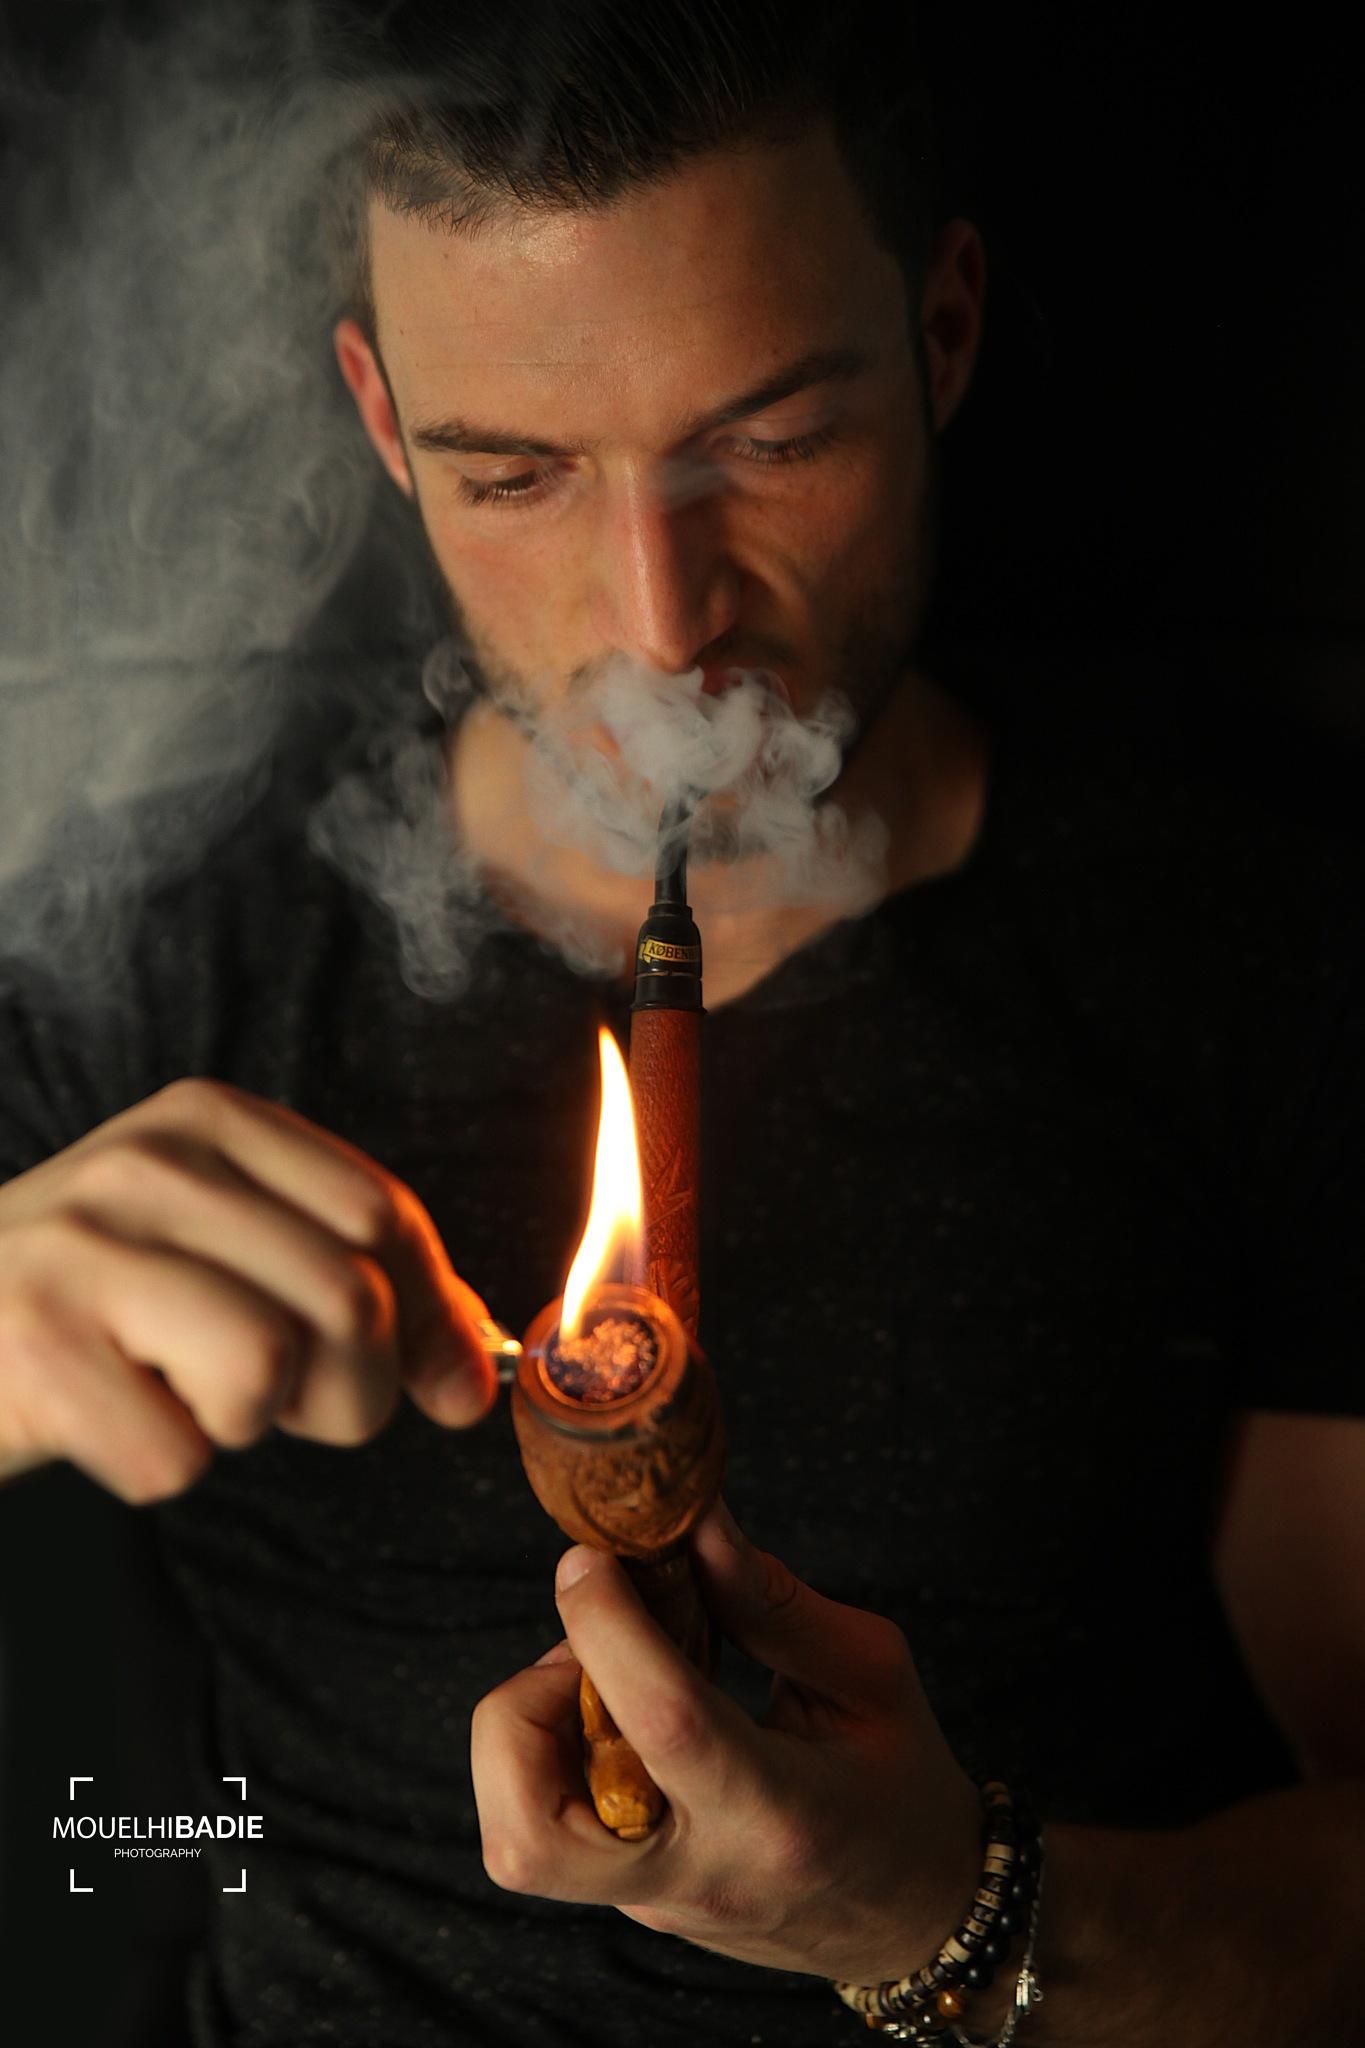 Smoke by Mouelhi Badie